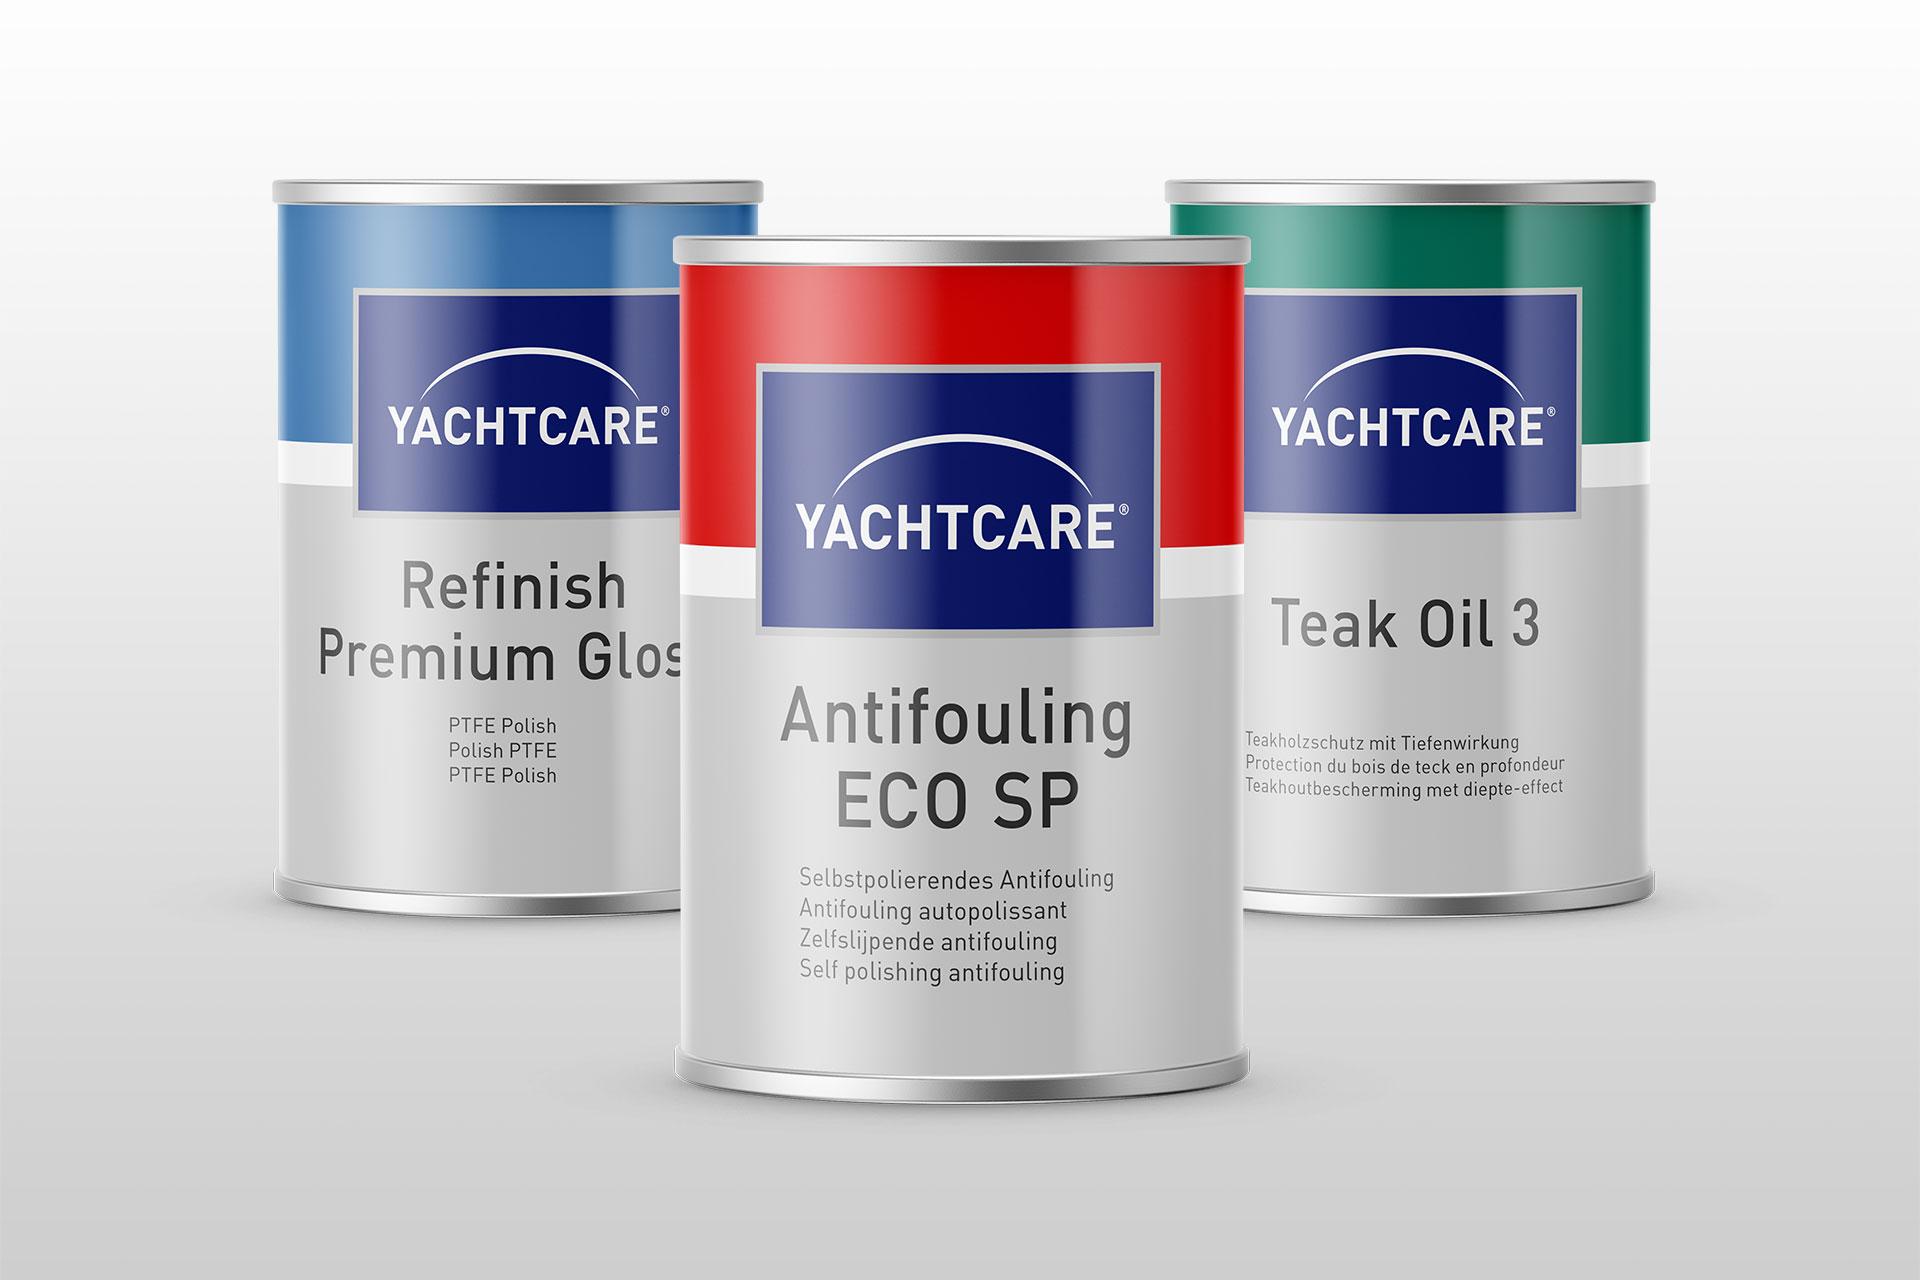 yachtcare-verpackungsdesign